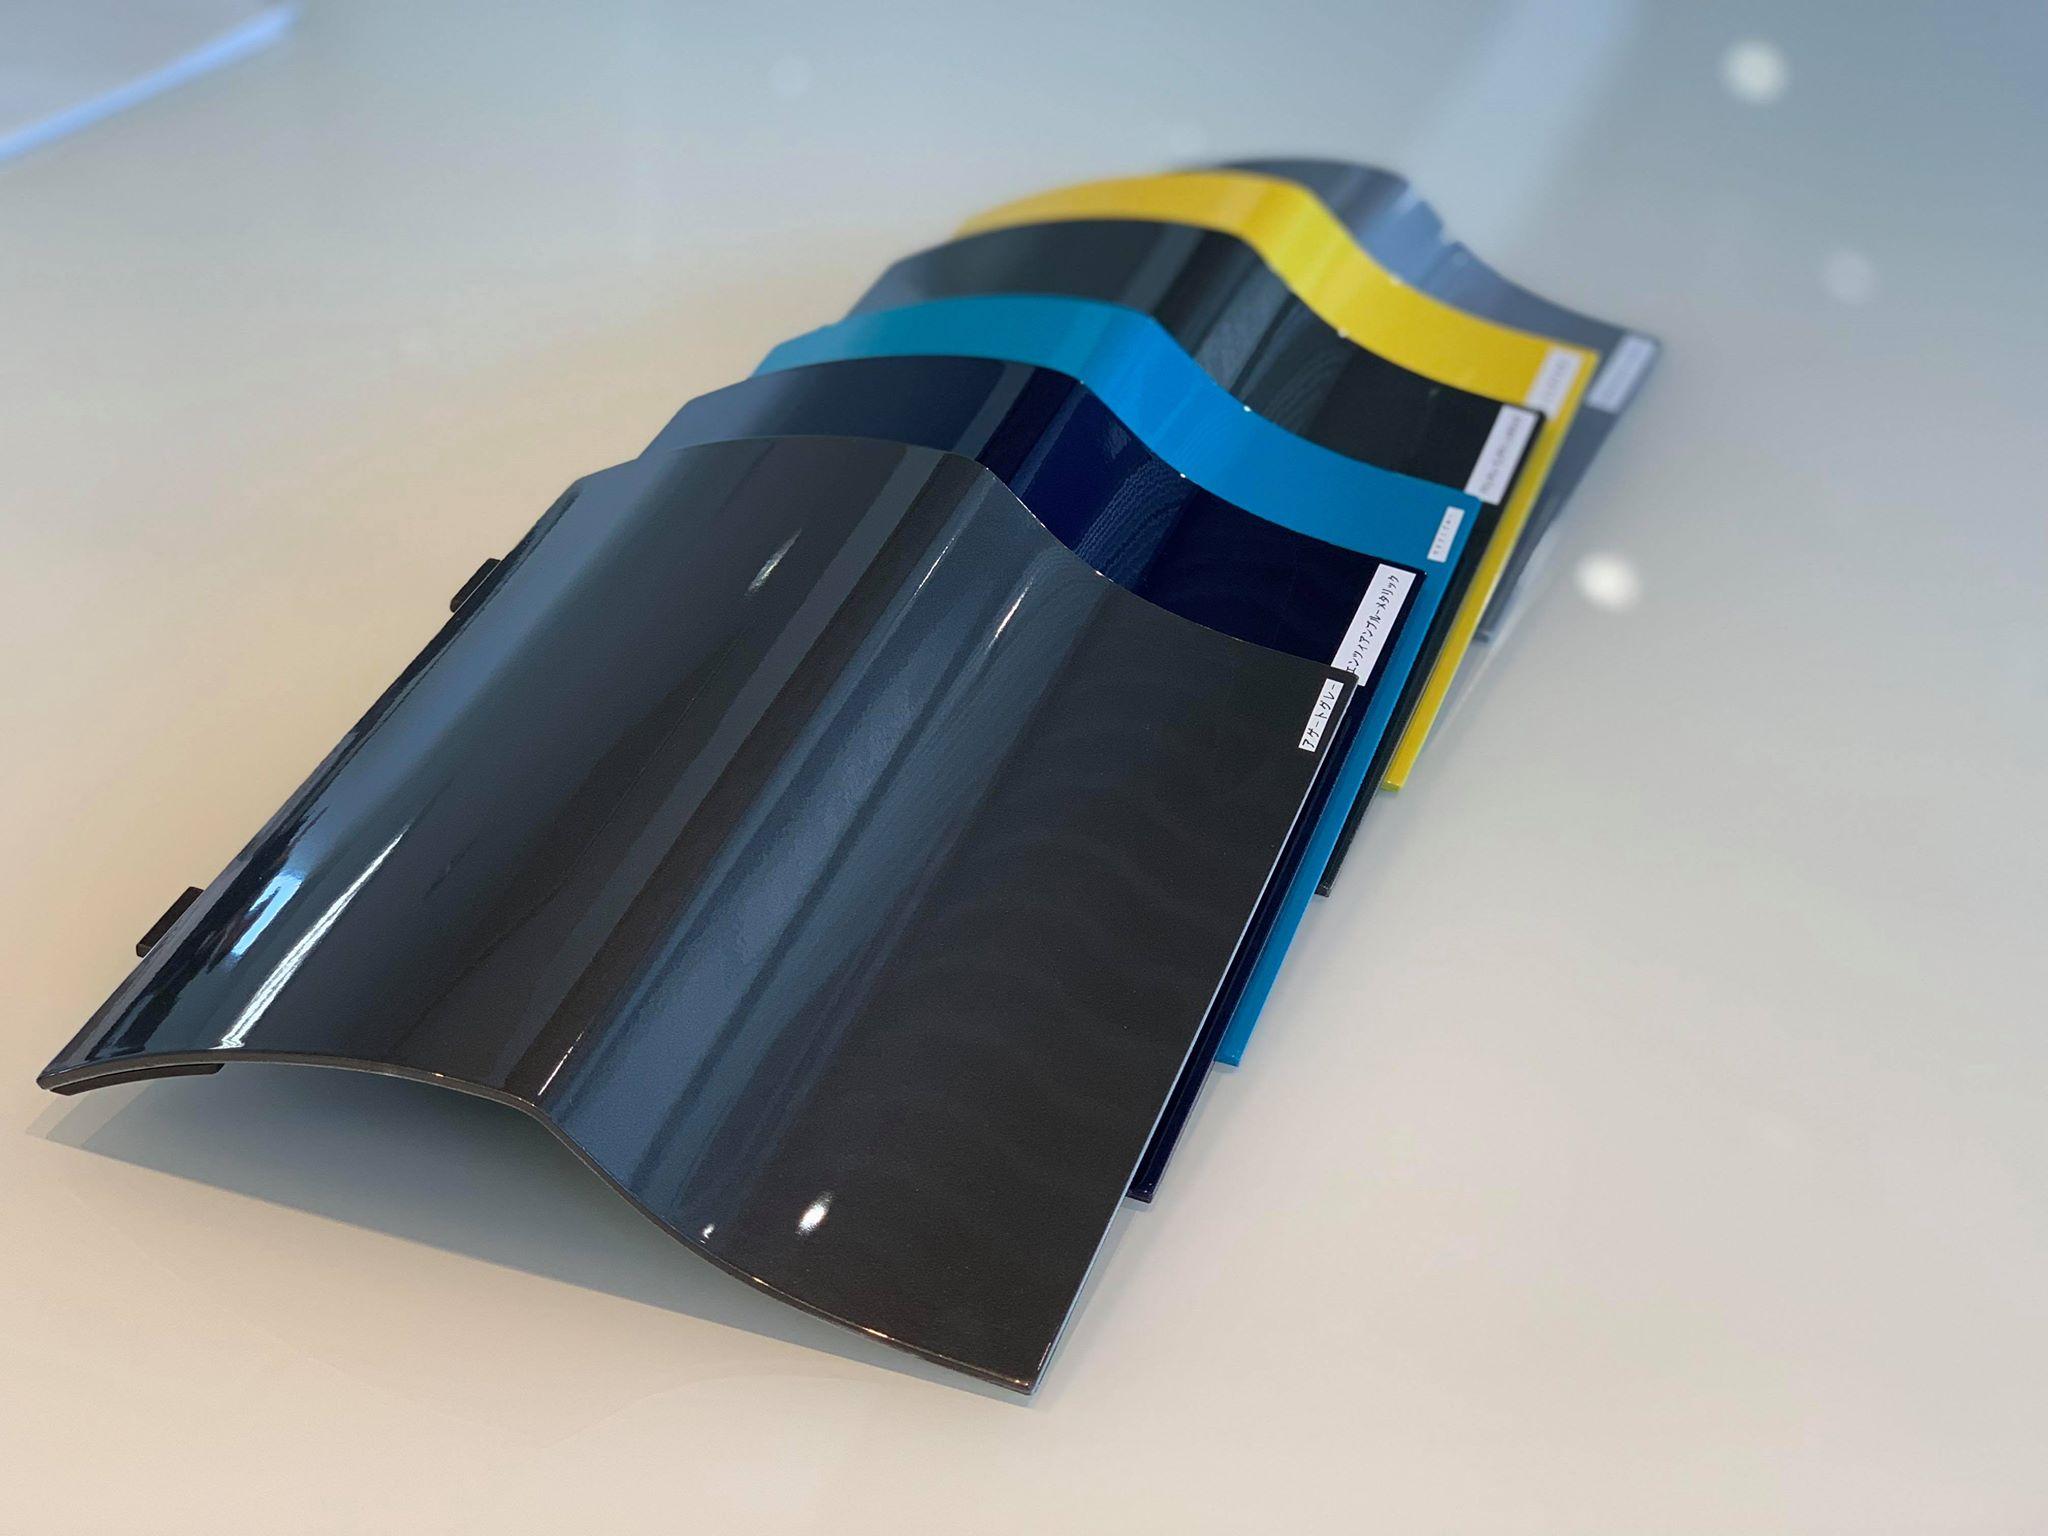 https://adelcars.co.jp/staffblog/images/61378545_595922974249687_4254897999907389440_n.jpg